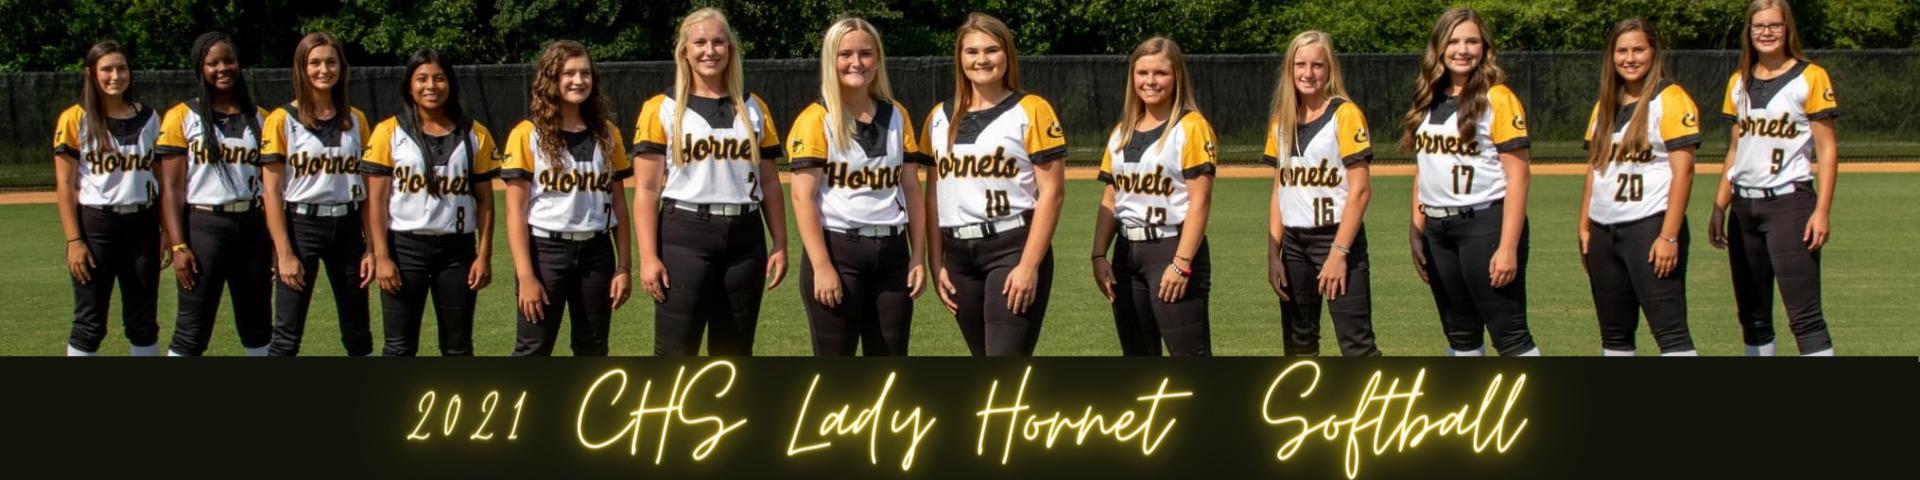 Lady Hornet Softball